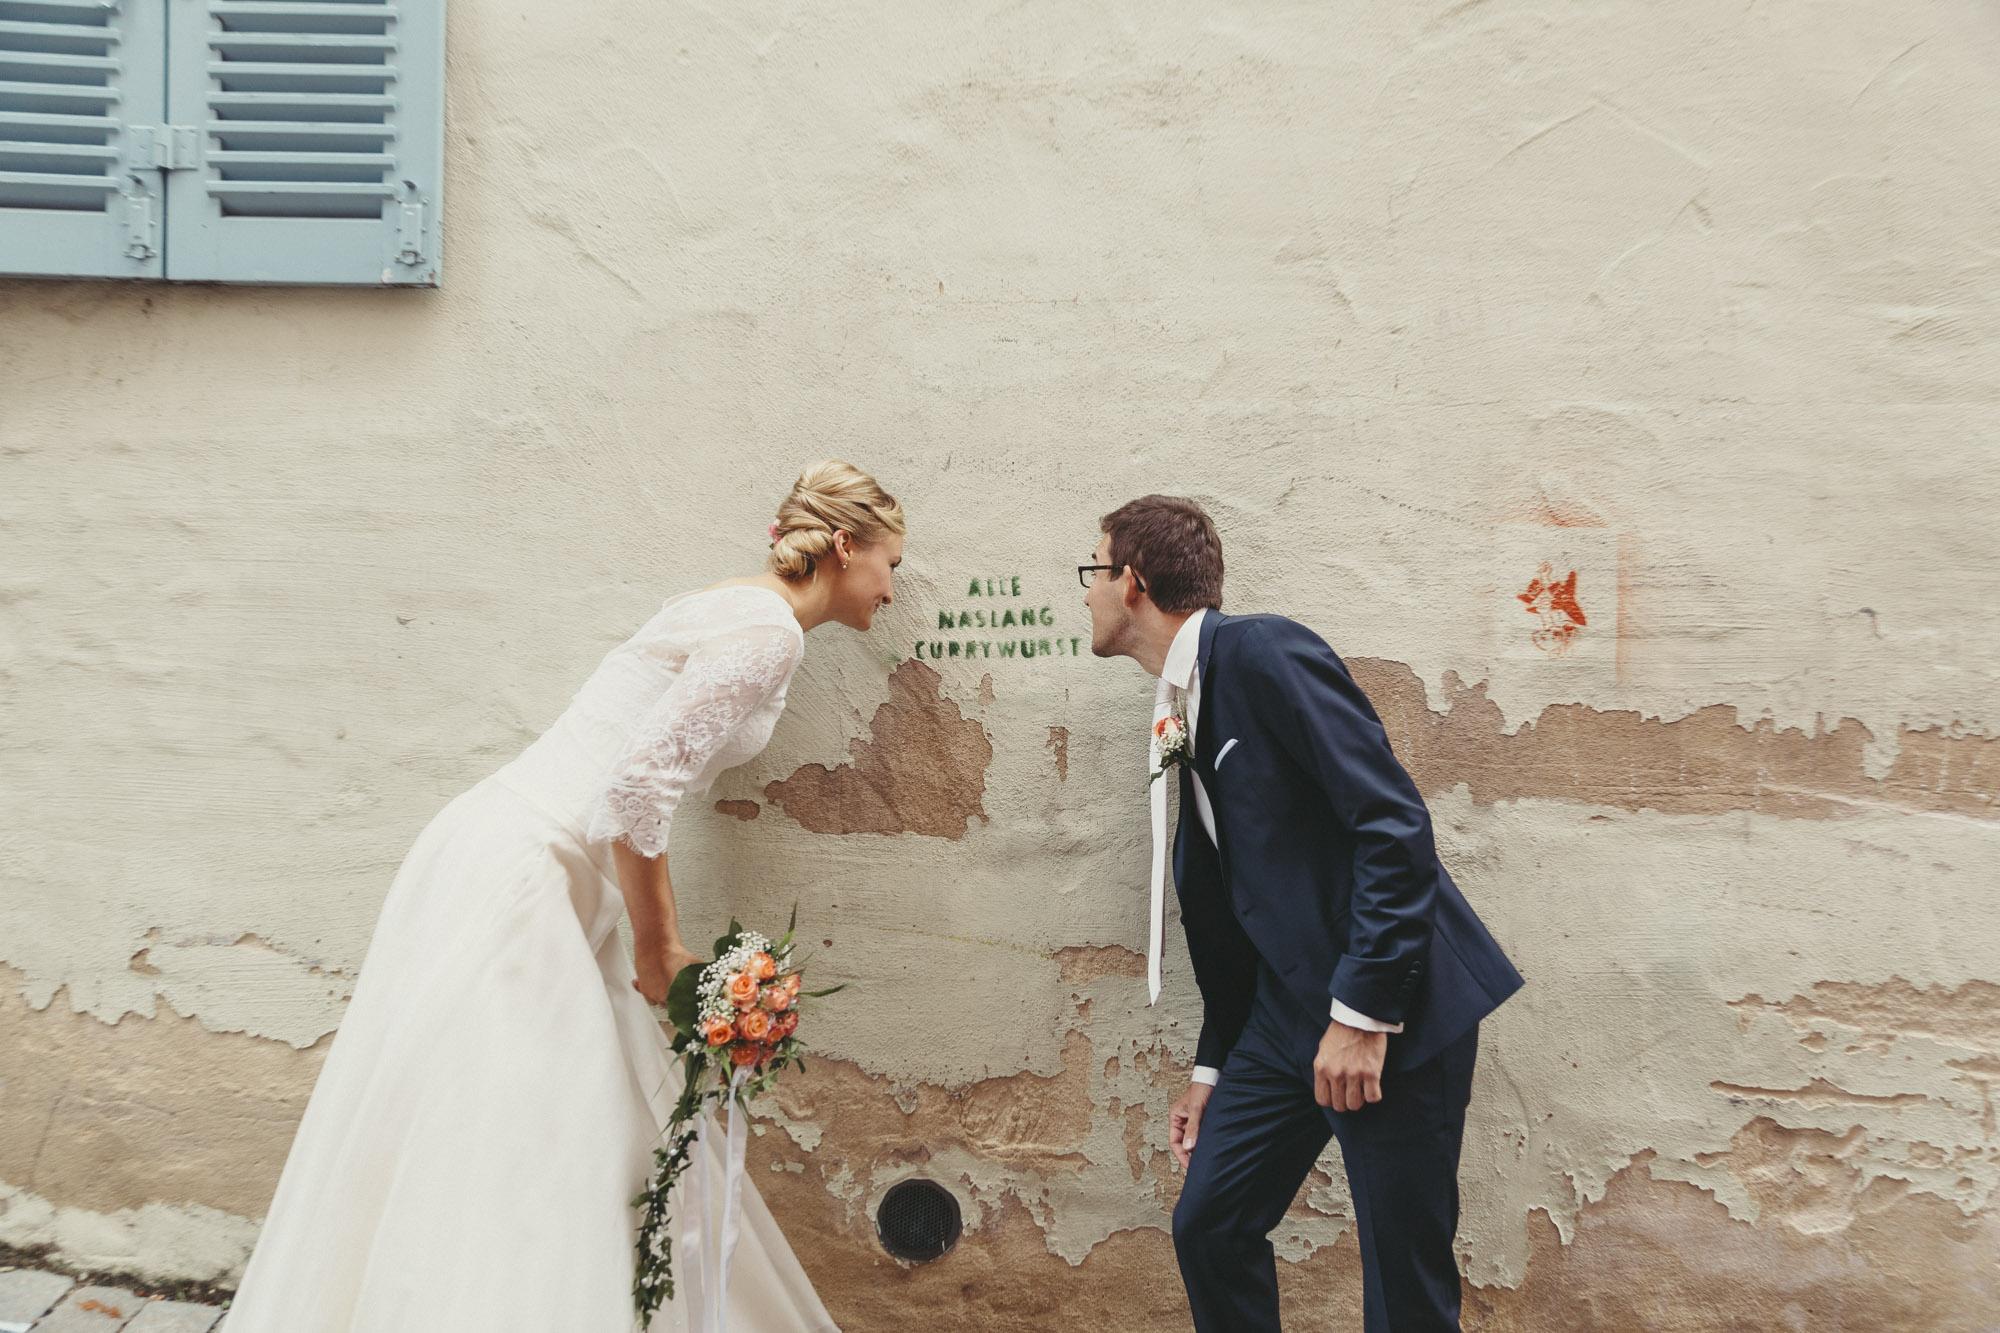 Hochzeitsfotografie-Tuebingen-Doro-Stefan-11